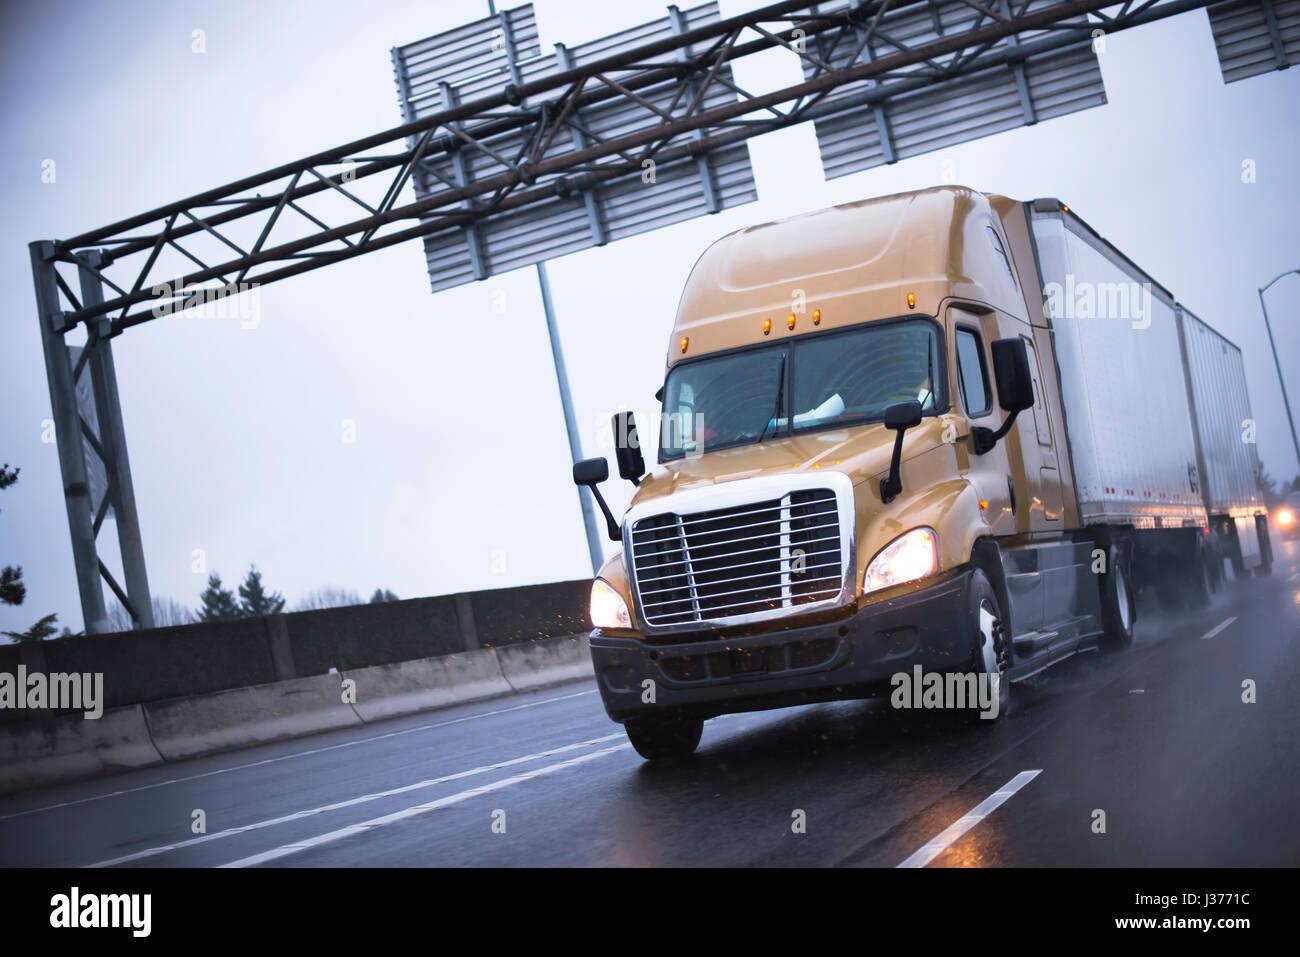 Brown Modern Big Rig Semi Truck Popular Among Drivers